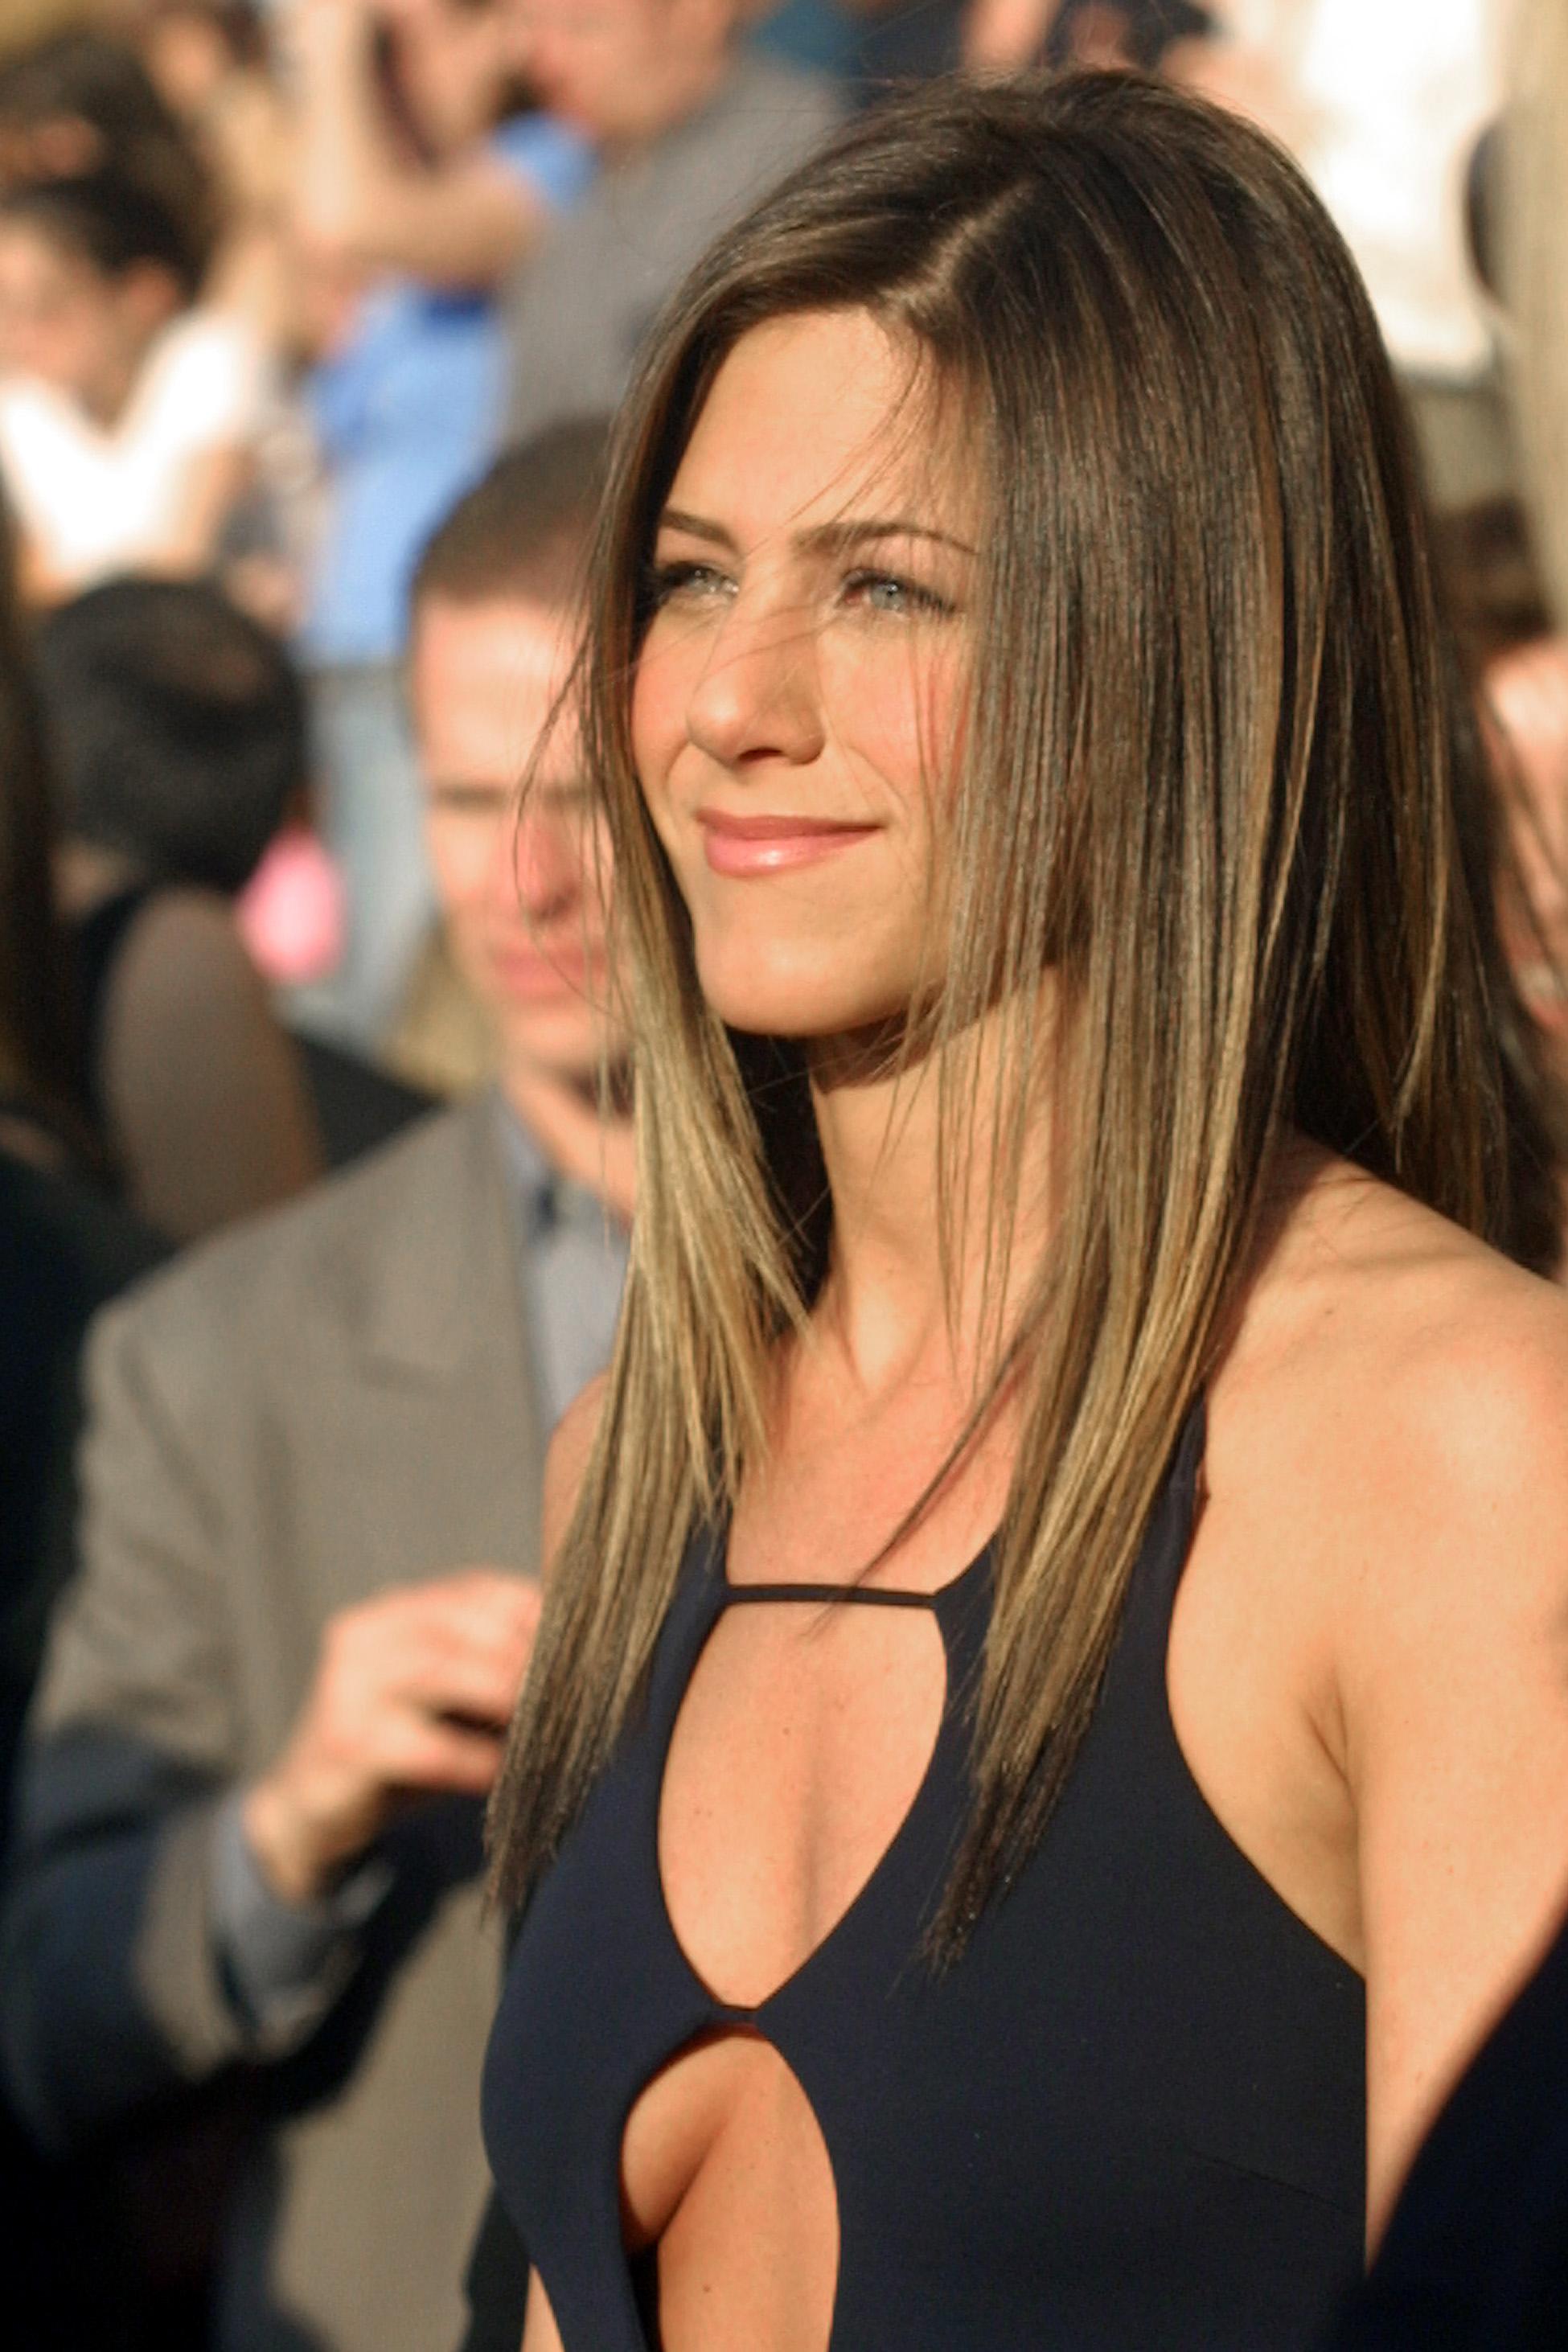 jennifer aniston celebrity actress - photo #11